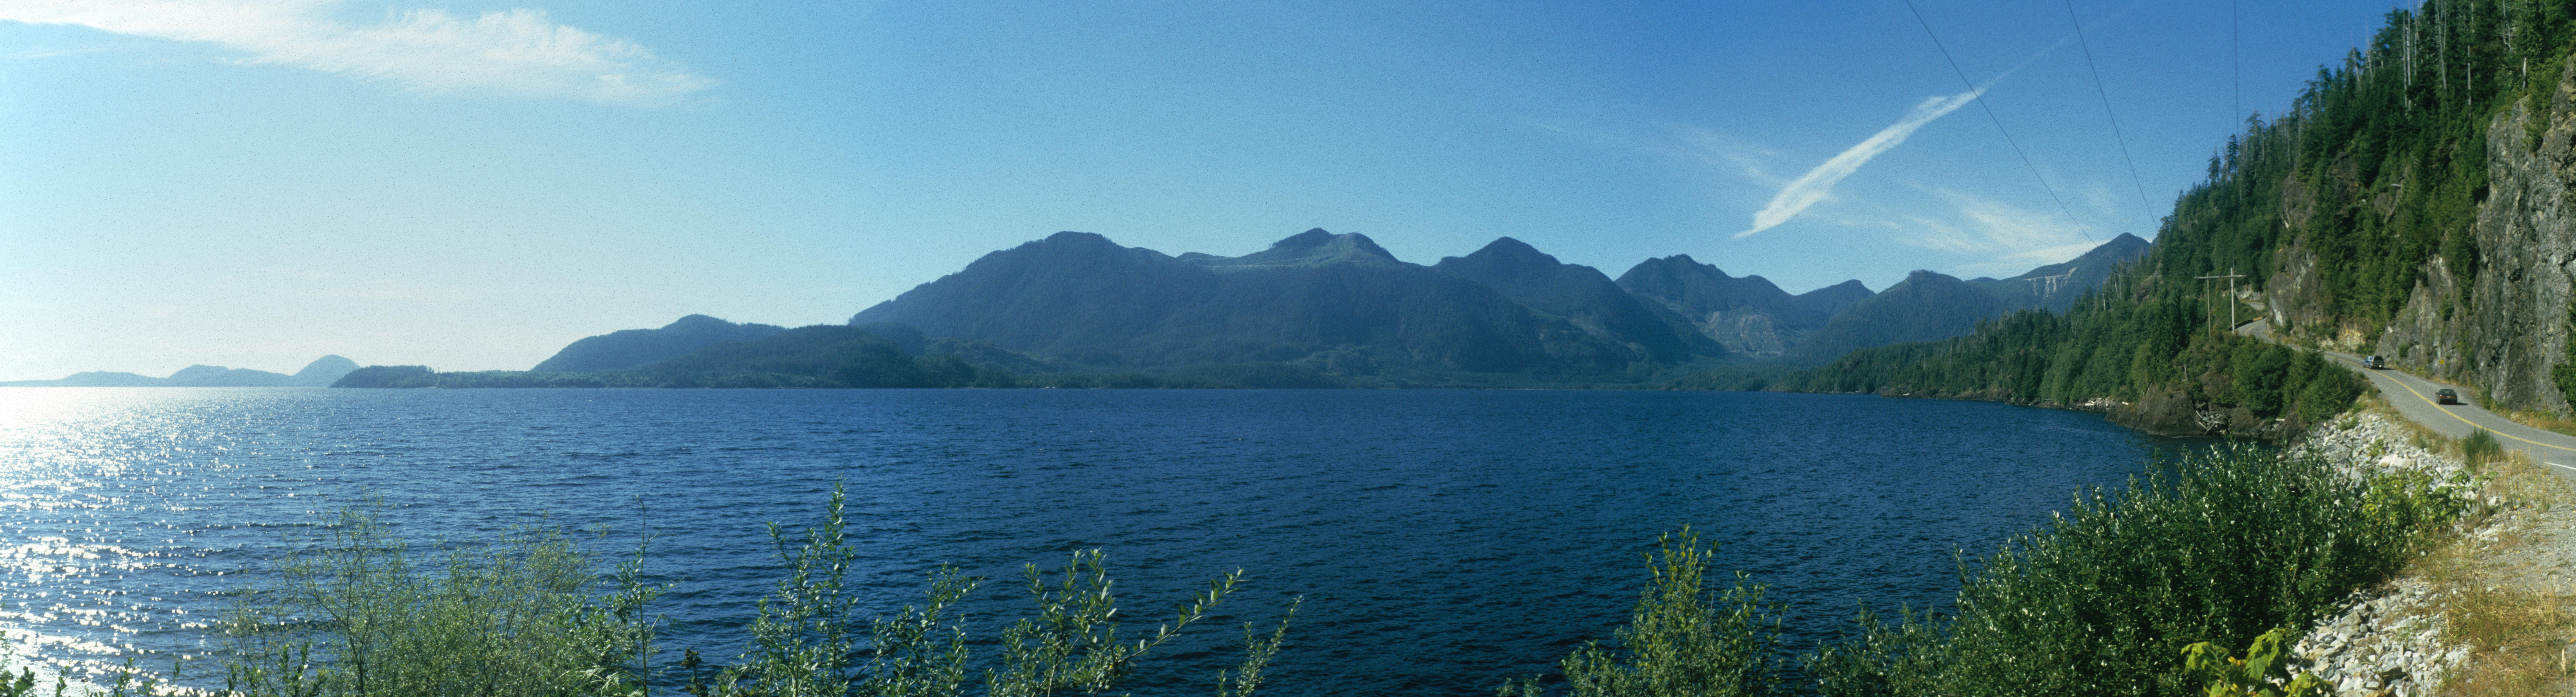 Kennedy Lake Vancouver Island Size